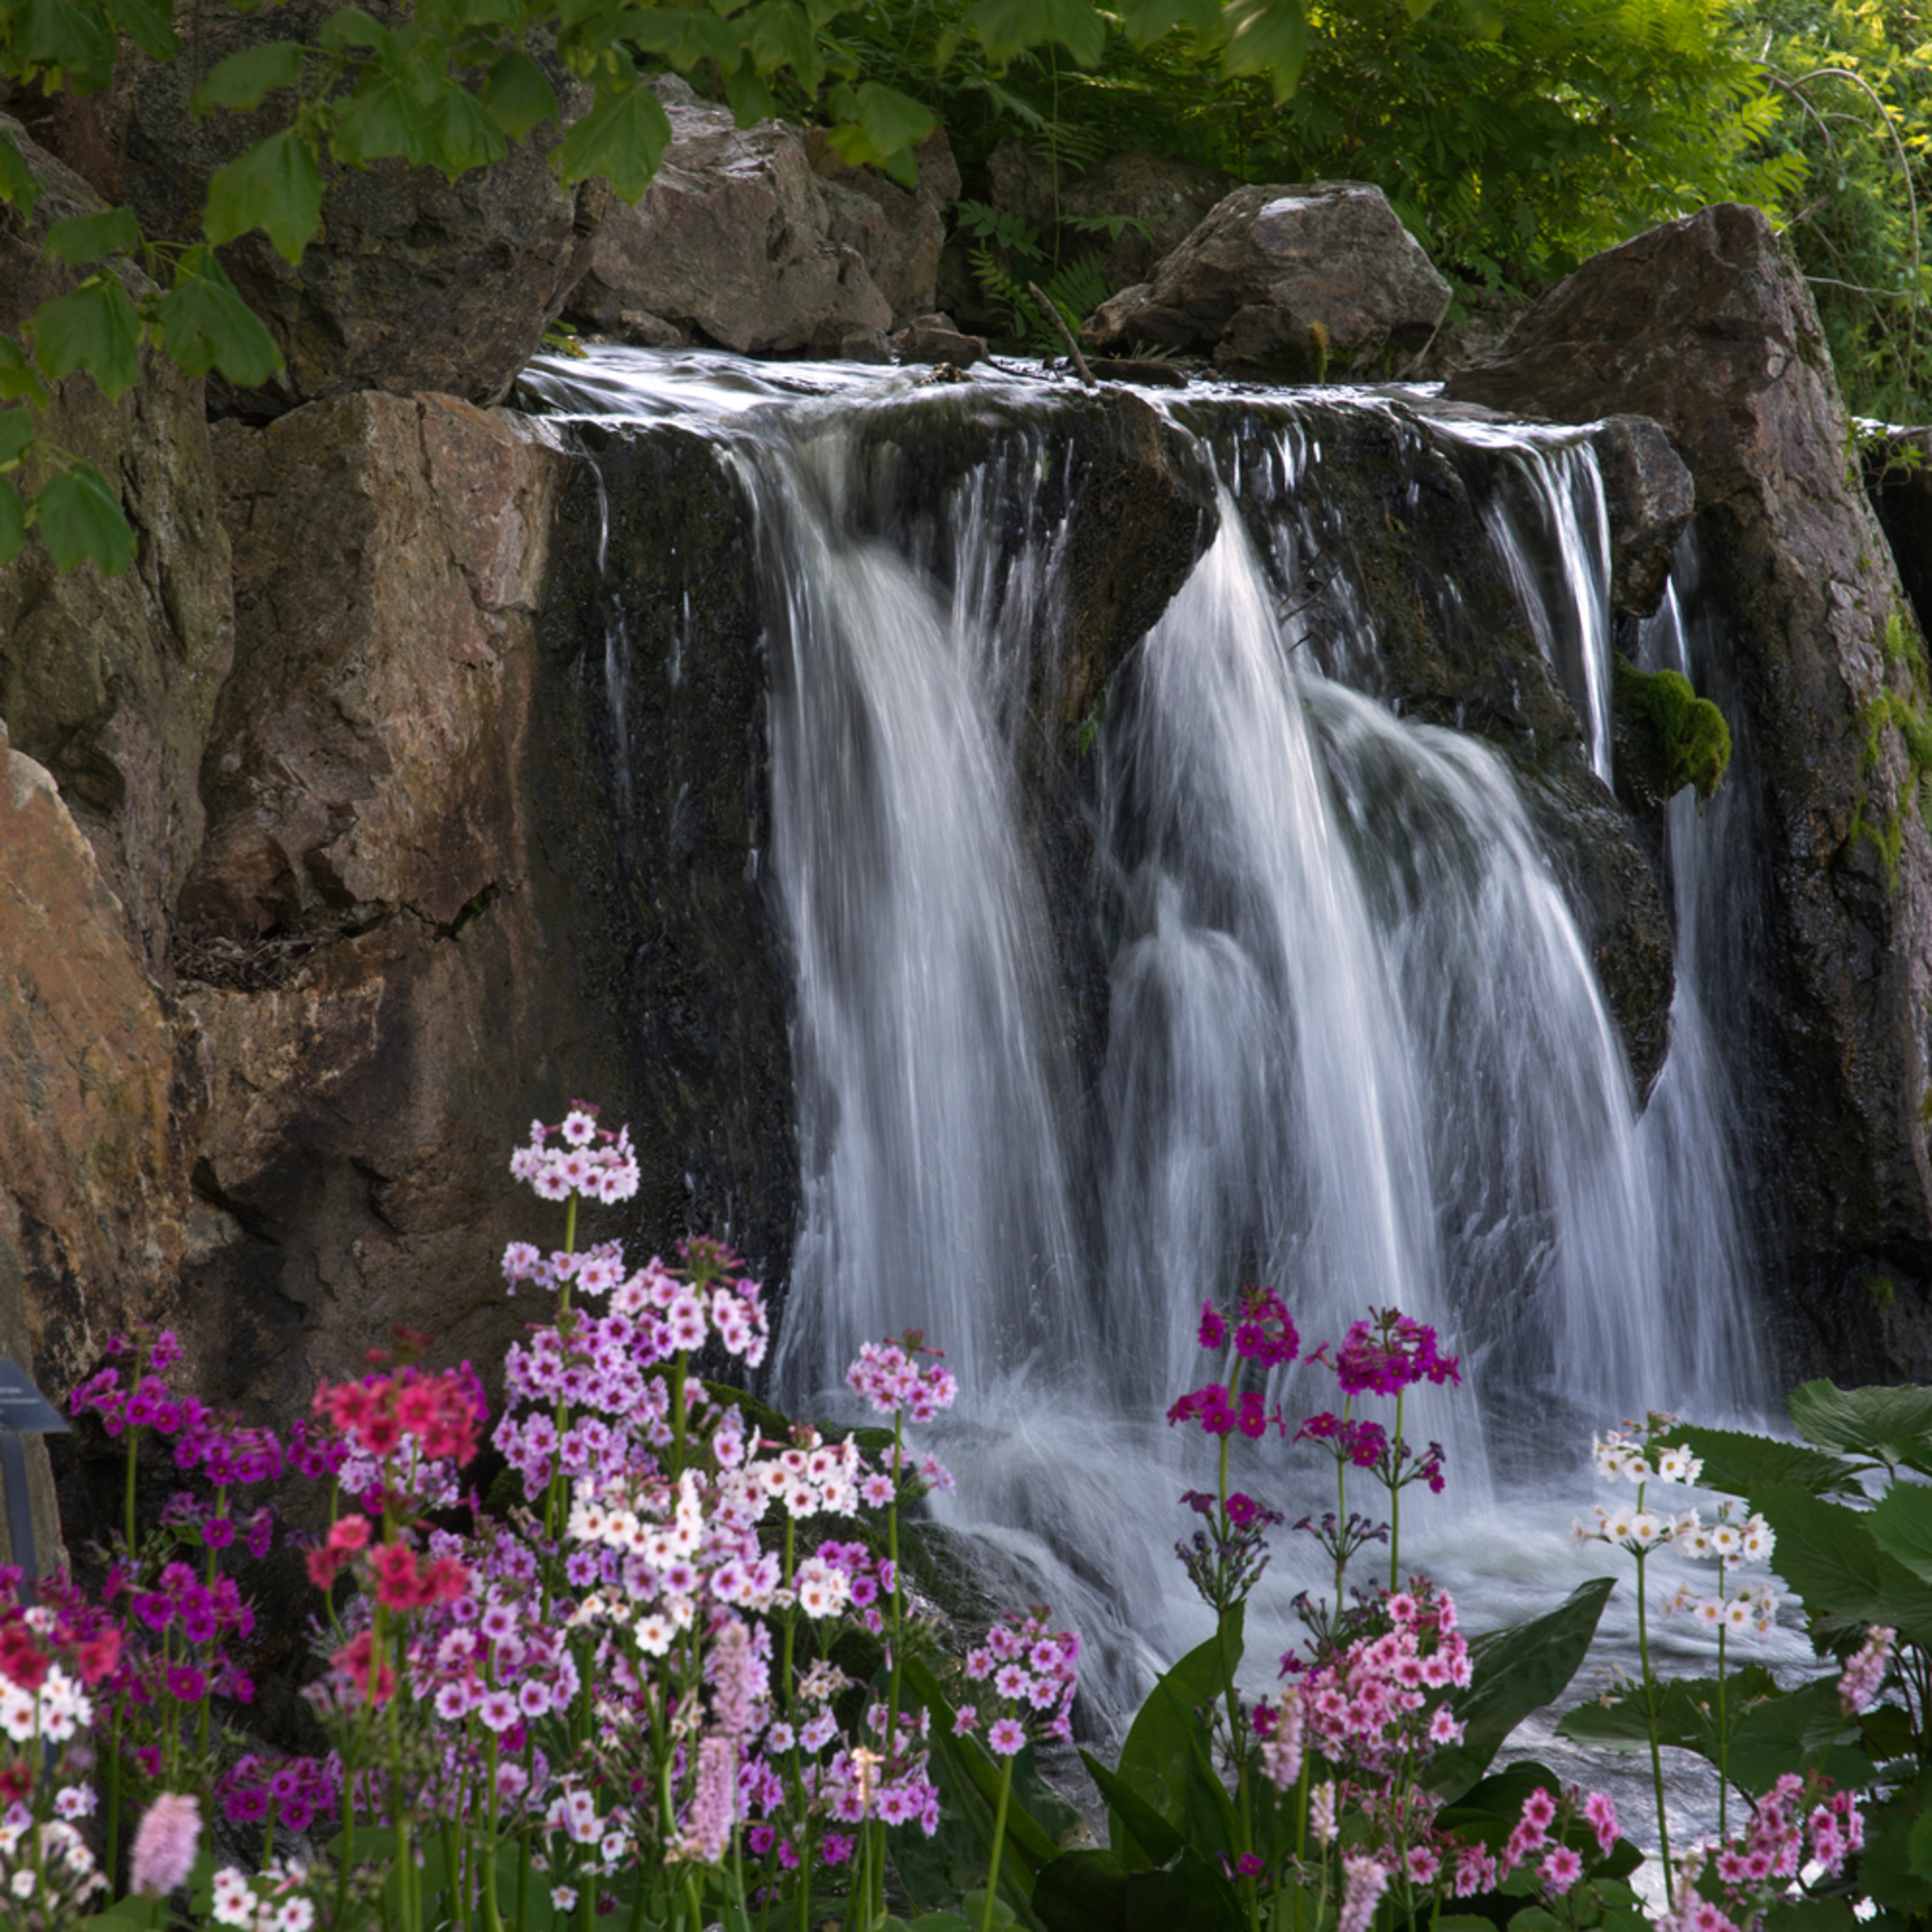 170528 botanic gardens 167 1 trw0jr